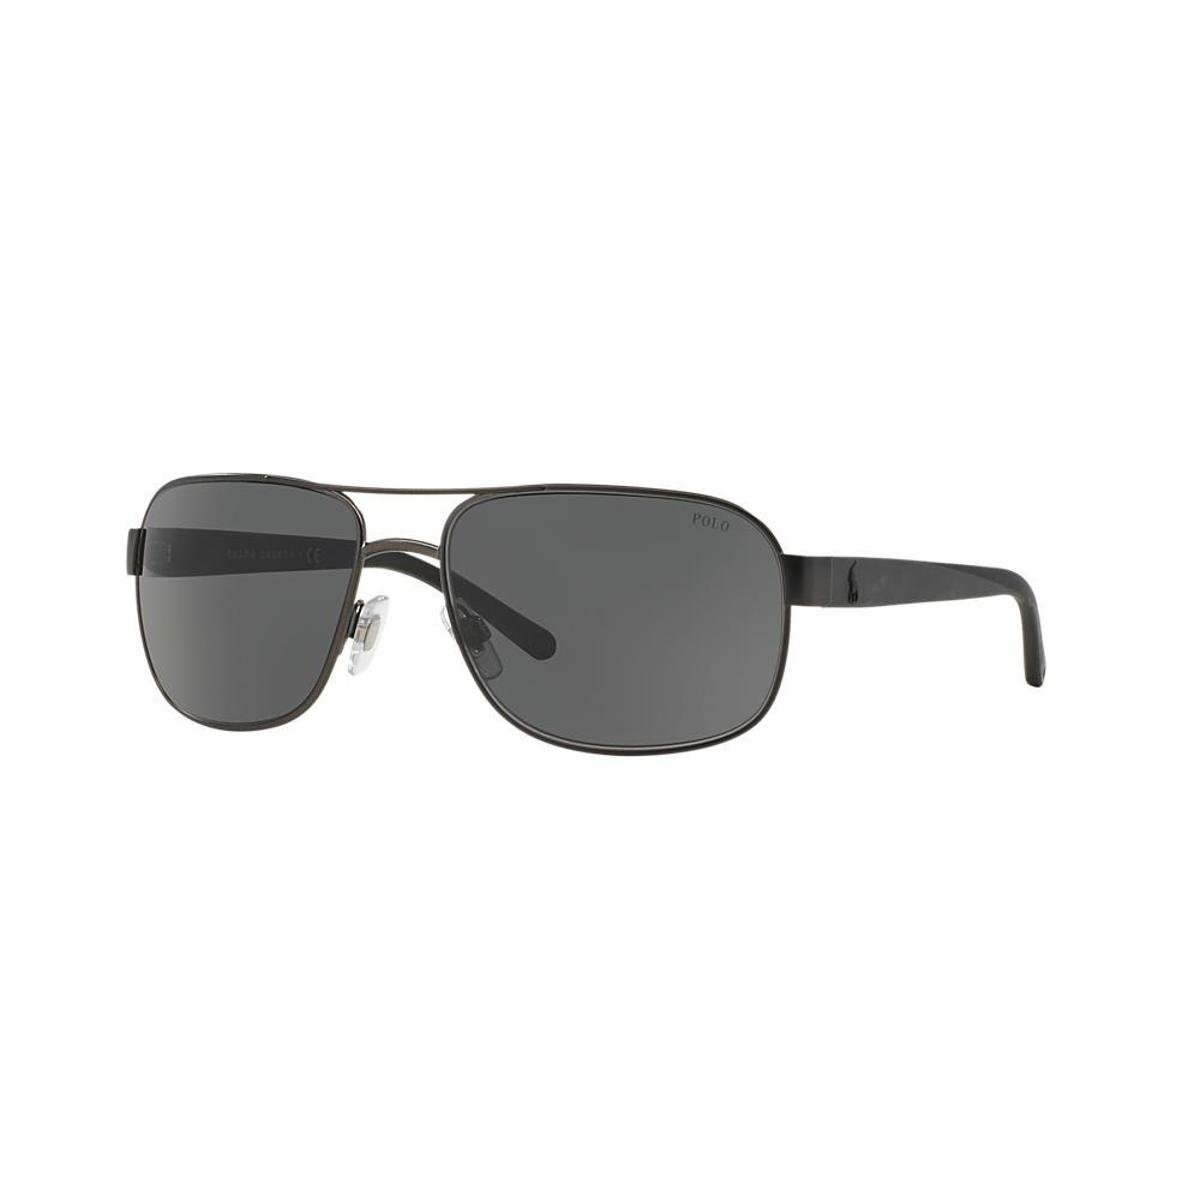 Óculos de Sol Polo Ralph Lauren Quadrado PH3093 Masculino - Compre ... 68f36dc8af